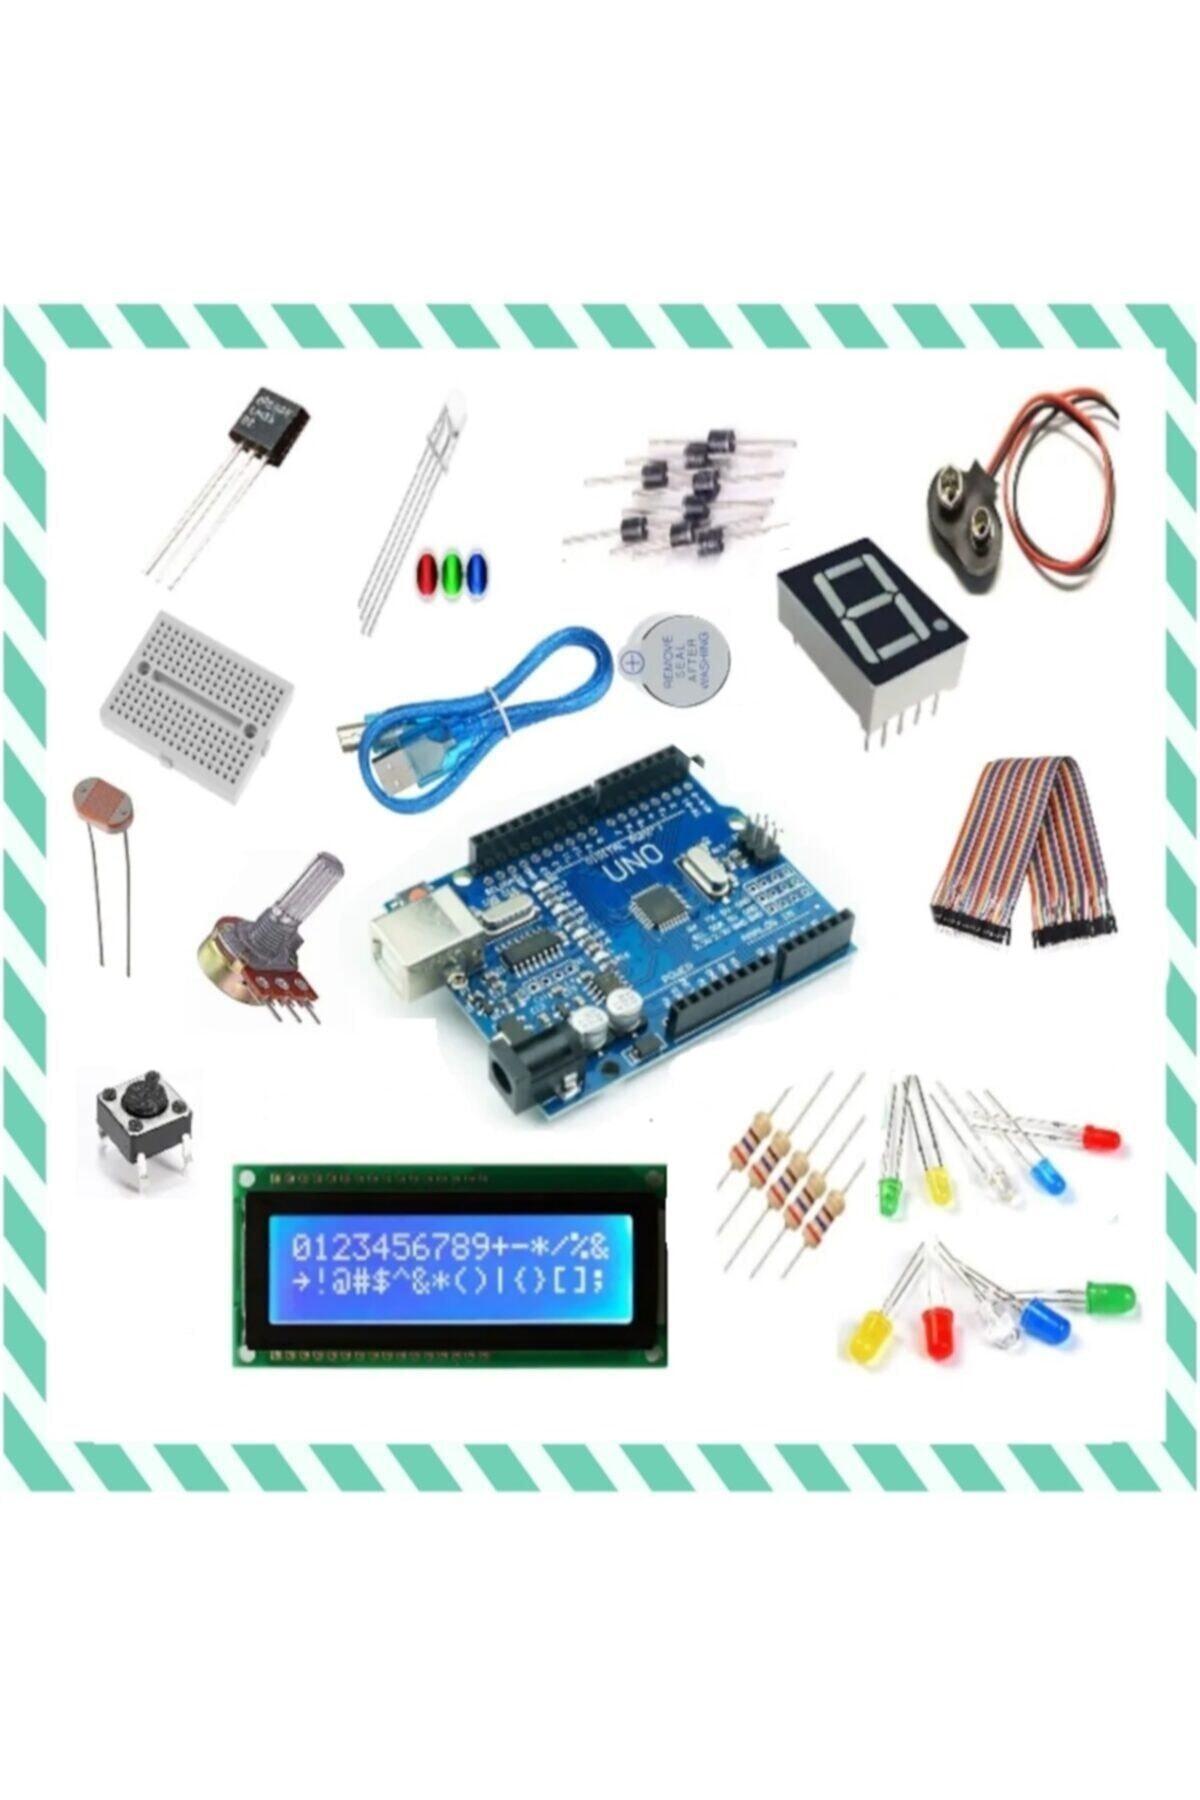 Arduino Uno R3 Başlangıç Seti - 25 Parça 130 Adet Set 1